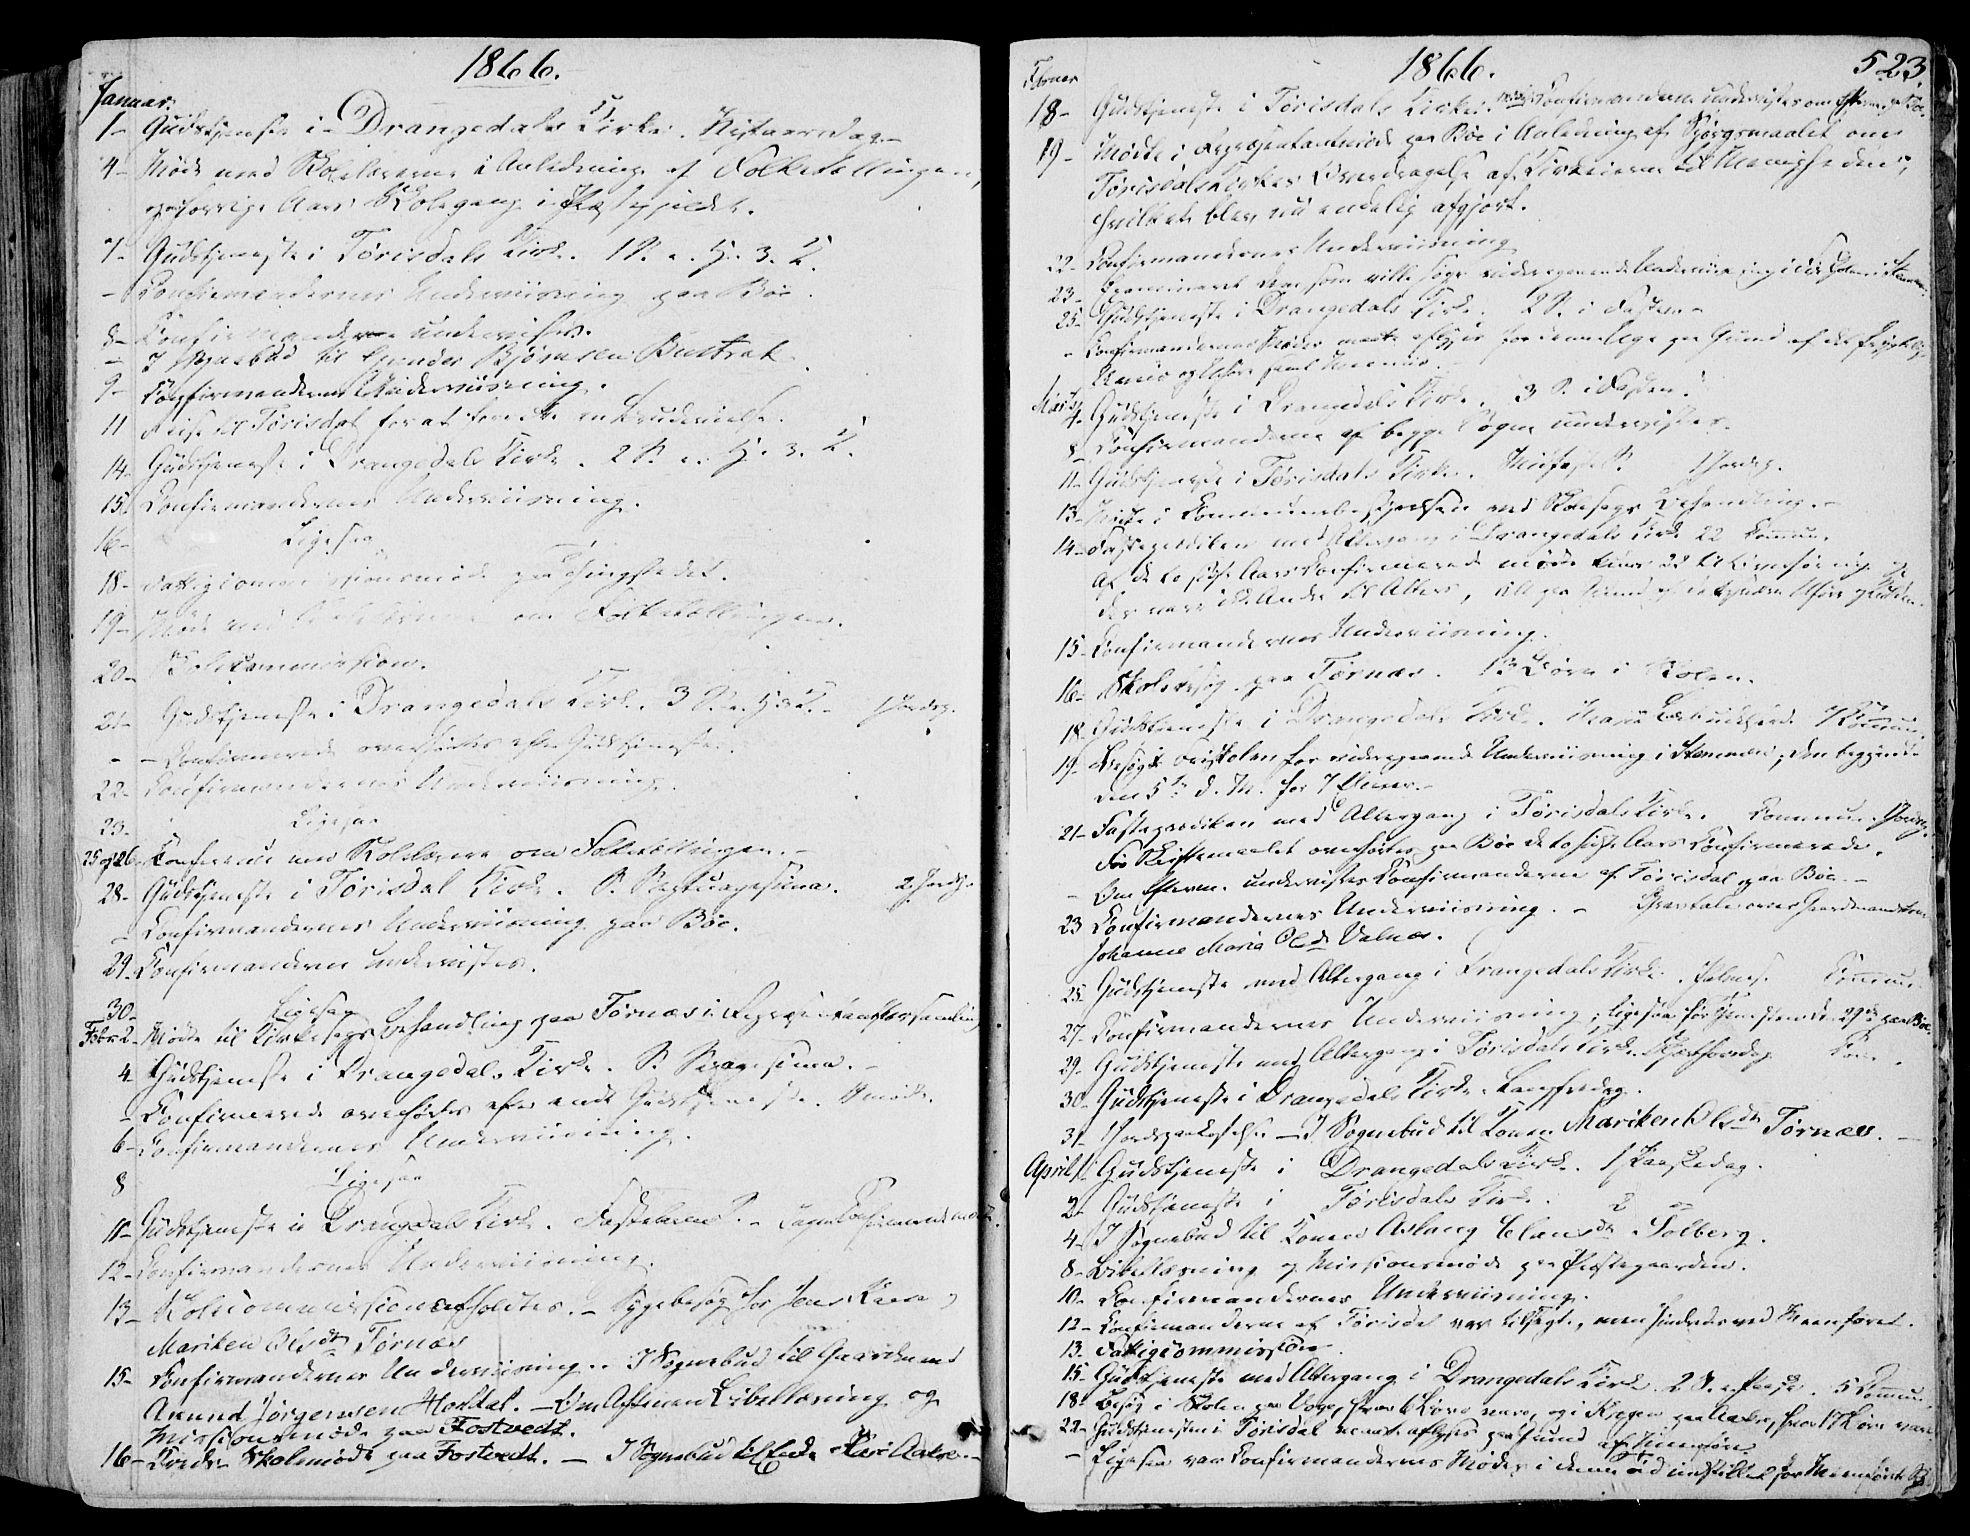 SAKO, Drangedal kirkebøker, F/Fa/L0008: Ministerialbok nr. 8, 1857-1871, s. 523